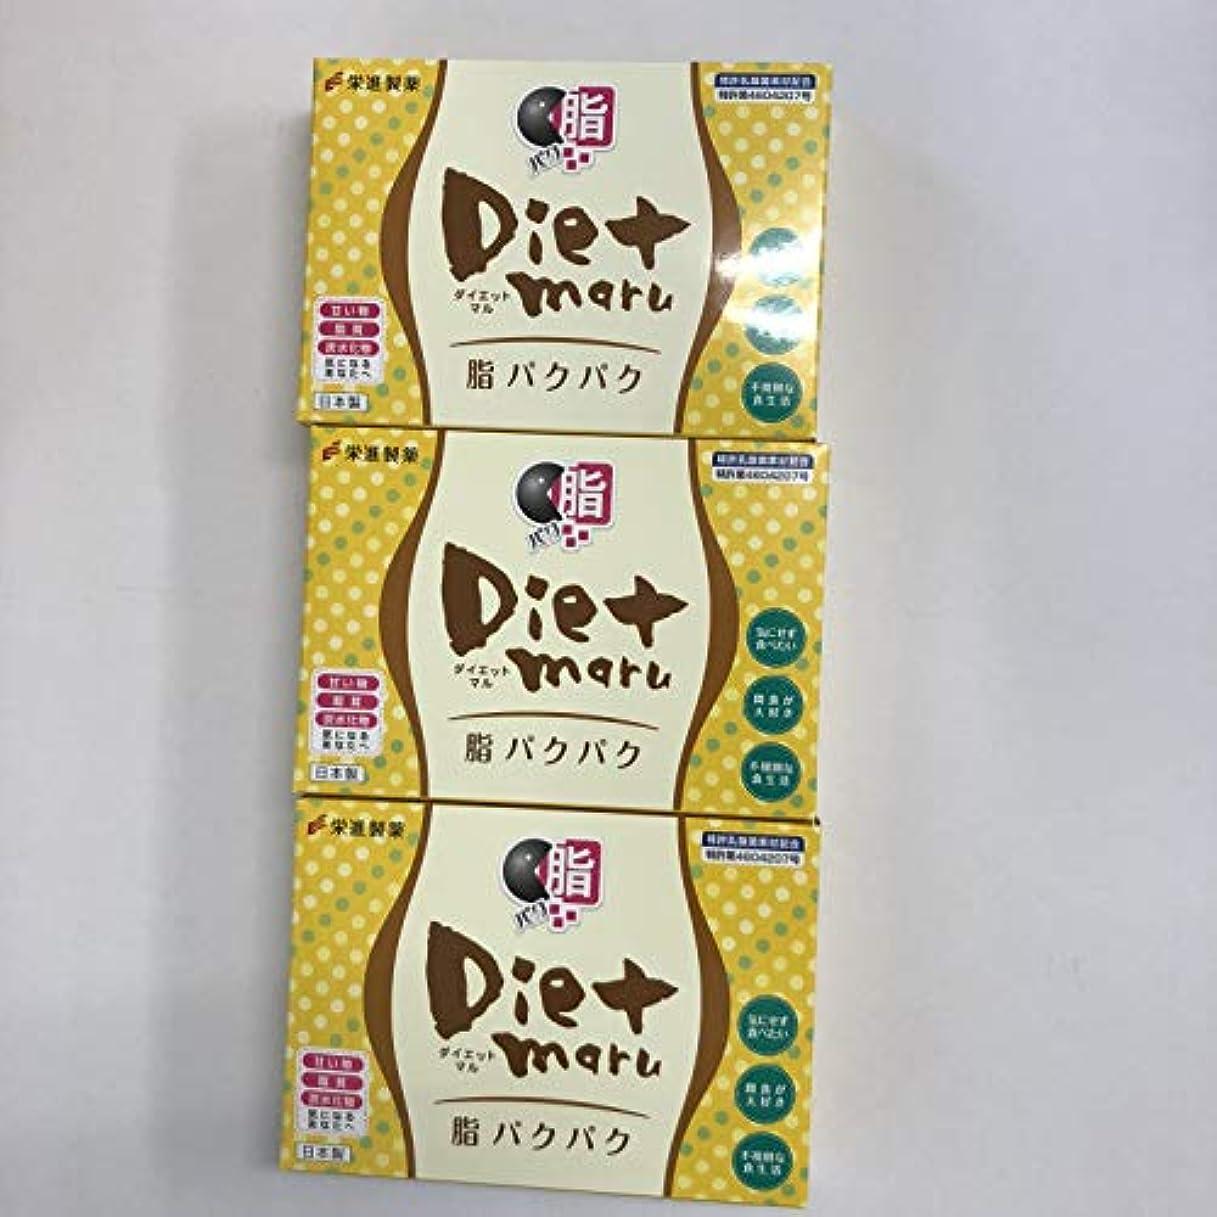 Diet maruダイエットマル 脂パクパク 吸脂丸 お得3個セット吃油丸